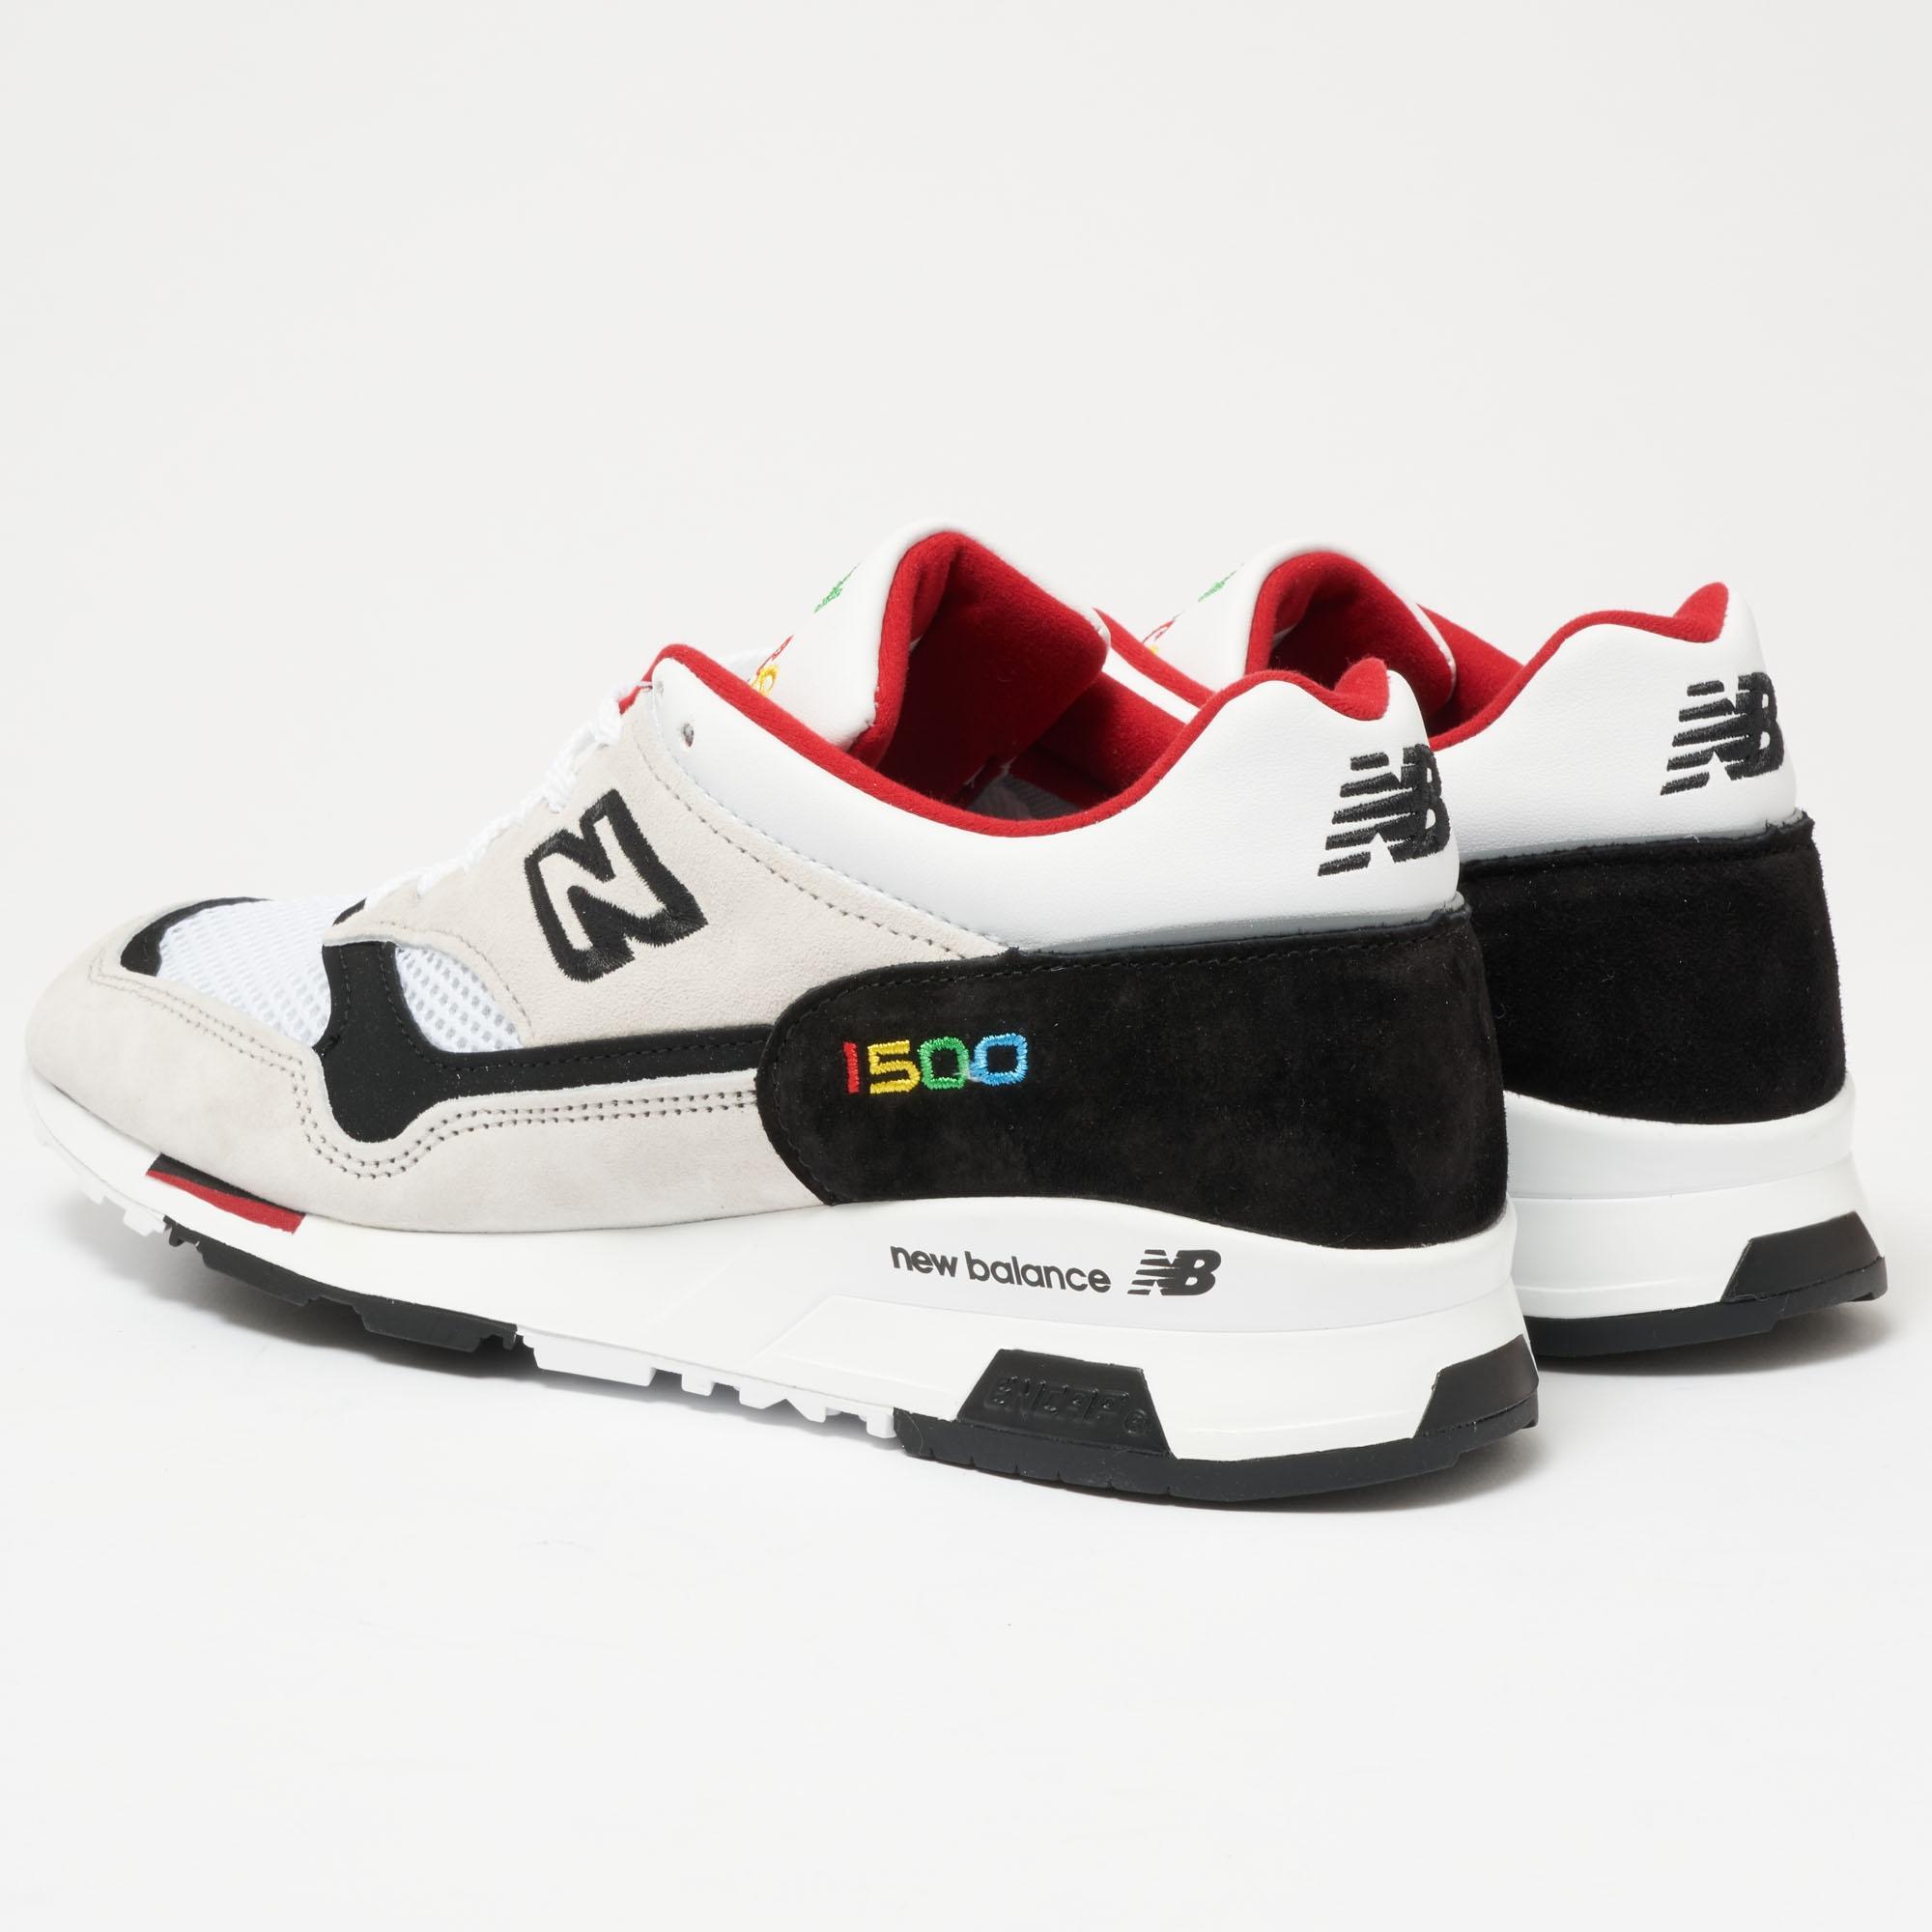 New Balance Color Prisma Made in UK 1500 Weiß Schwarz Schuhe